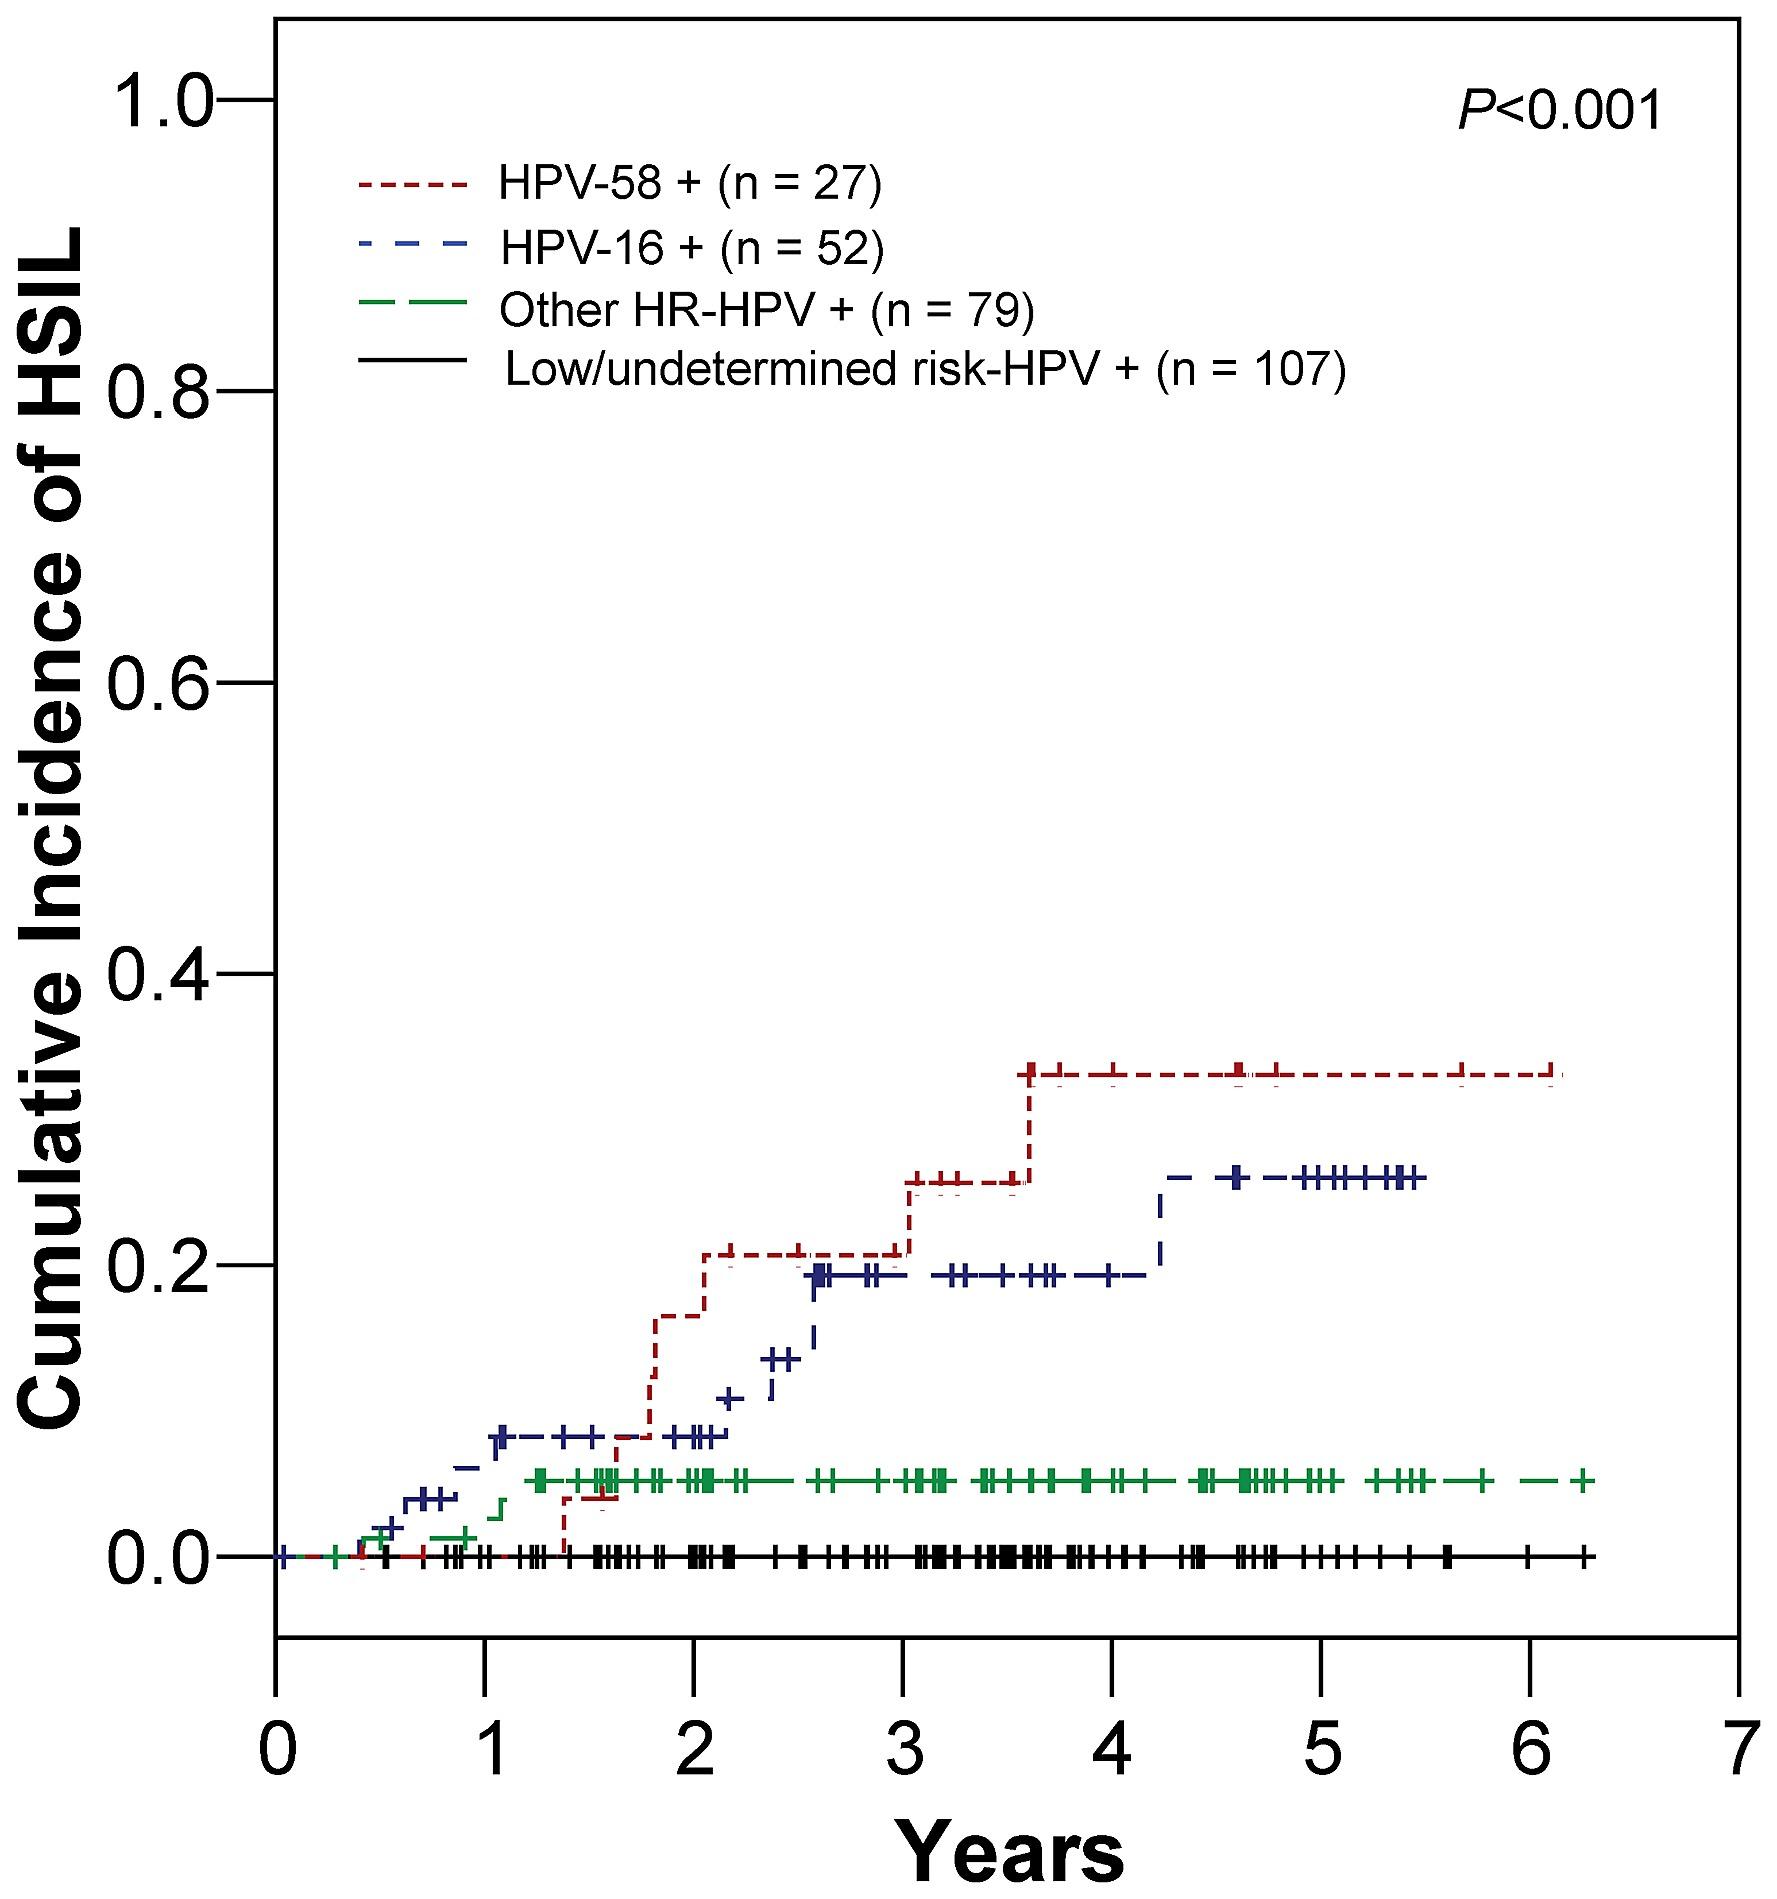 Autentificare - Hpv intraepithelial lesion